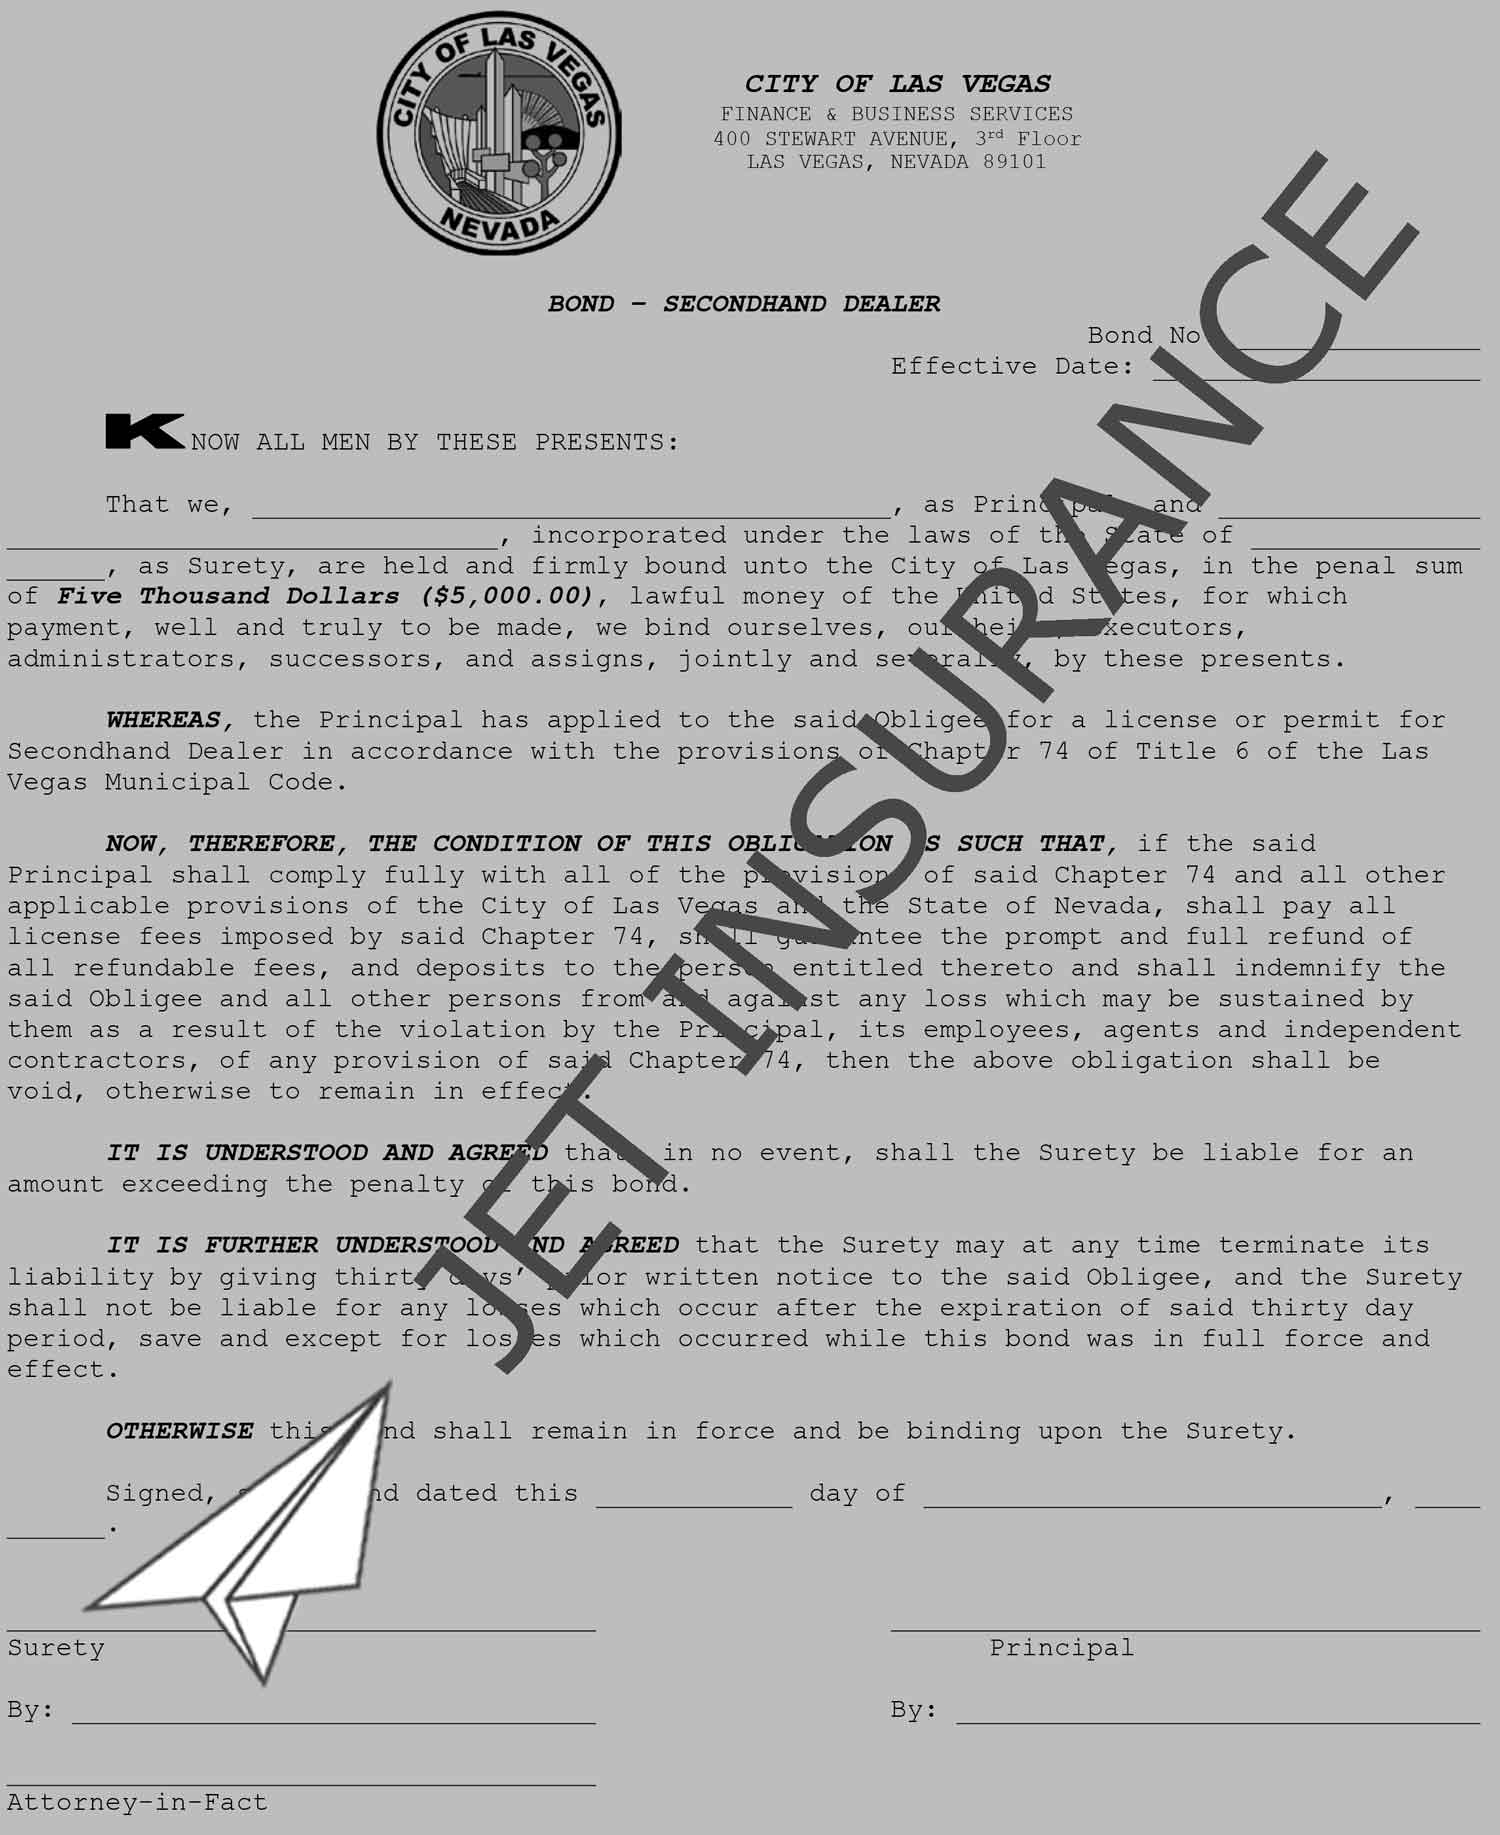 Las Vegas Nevada Secondhand Dealer Bond Form